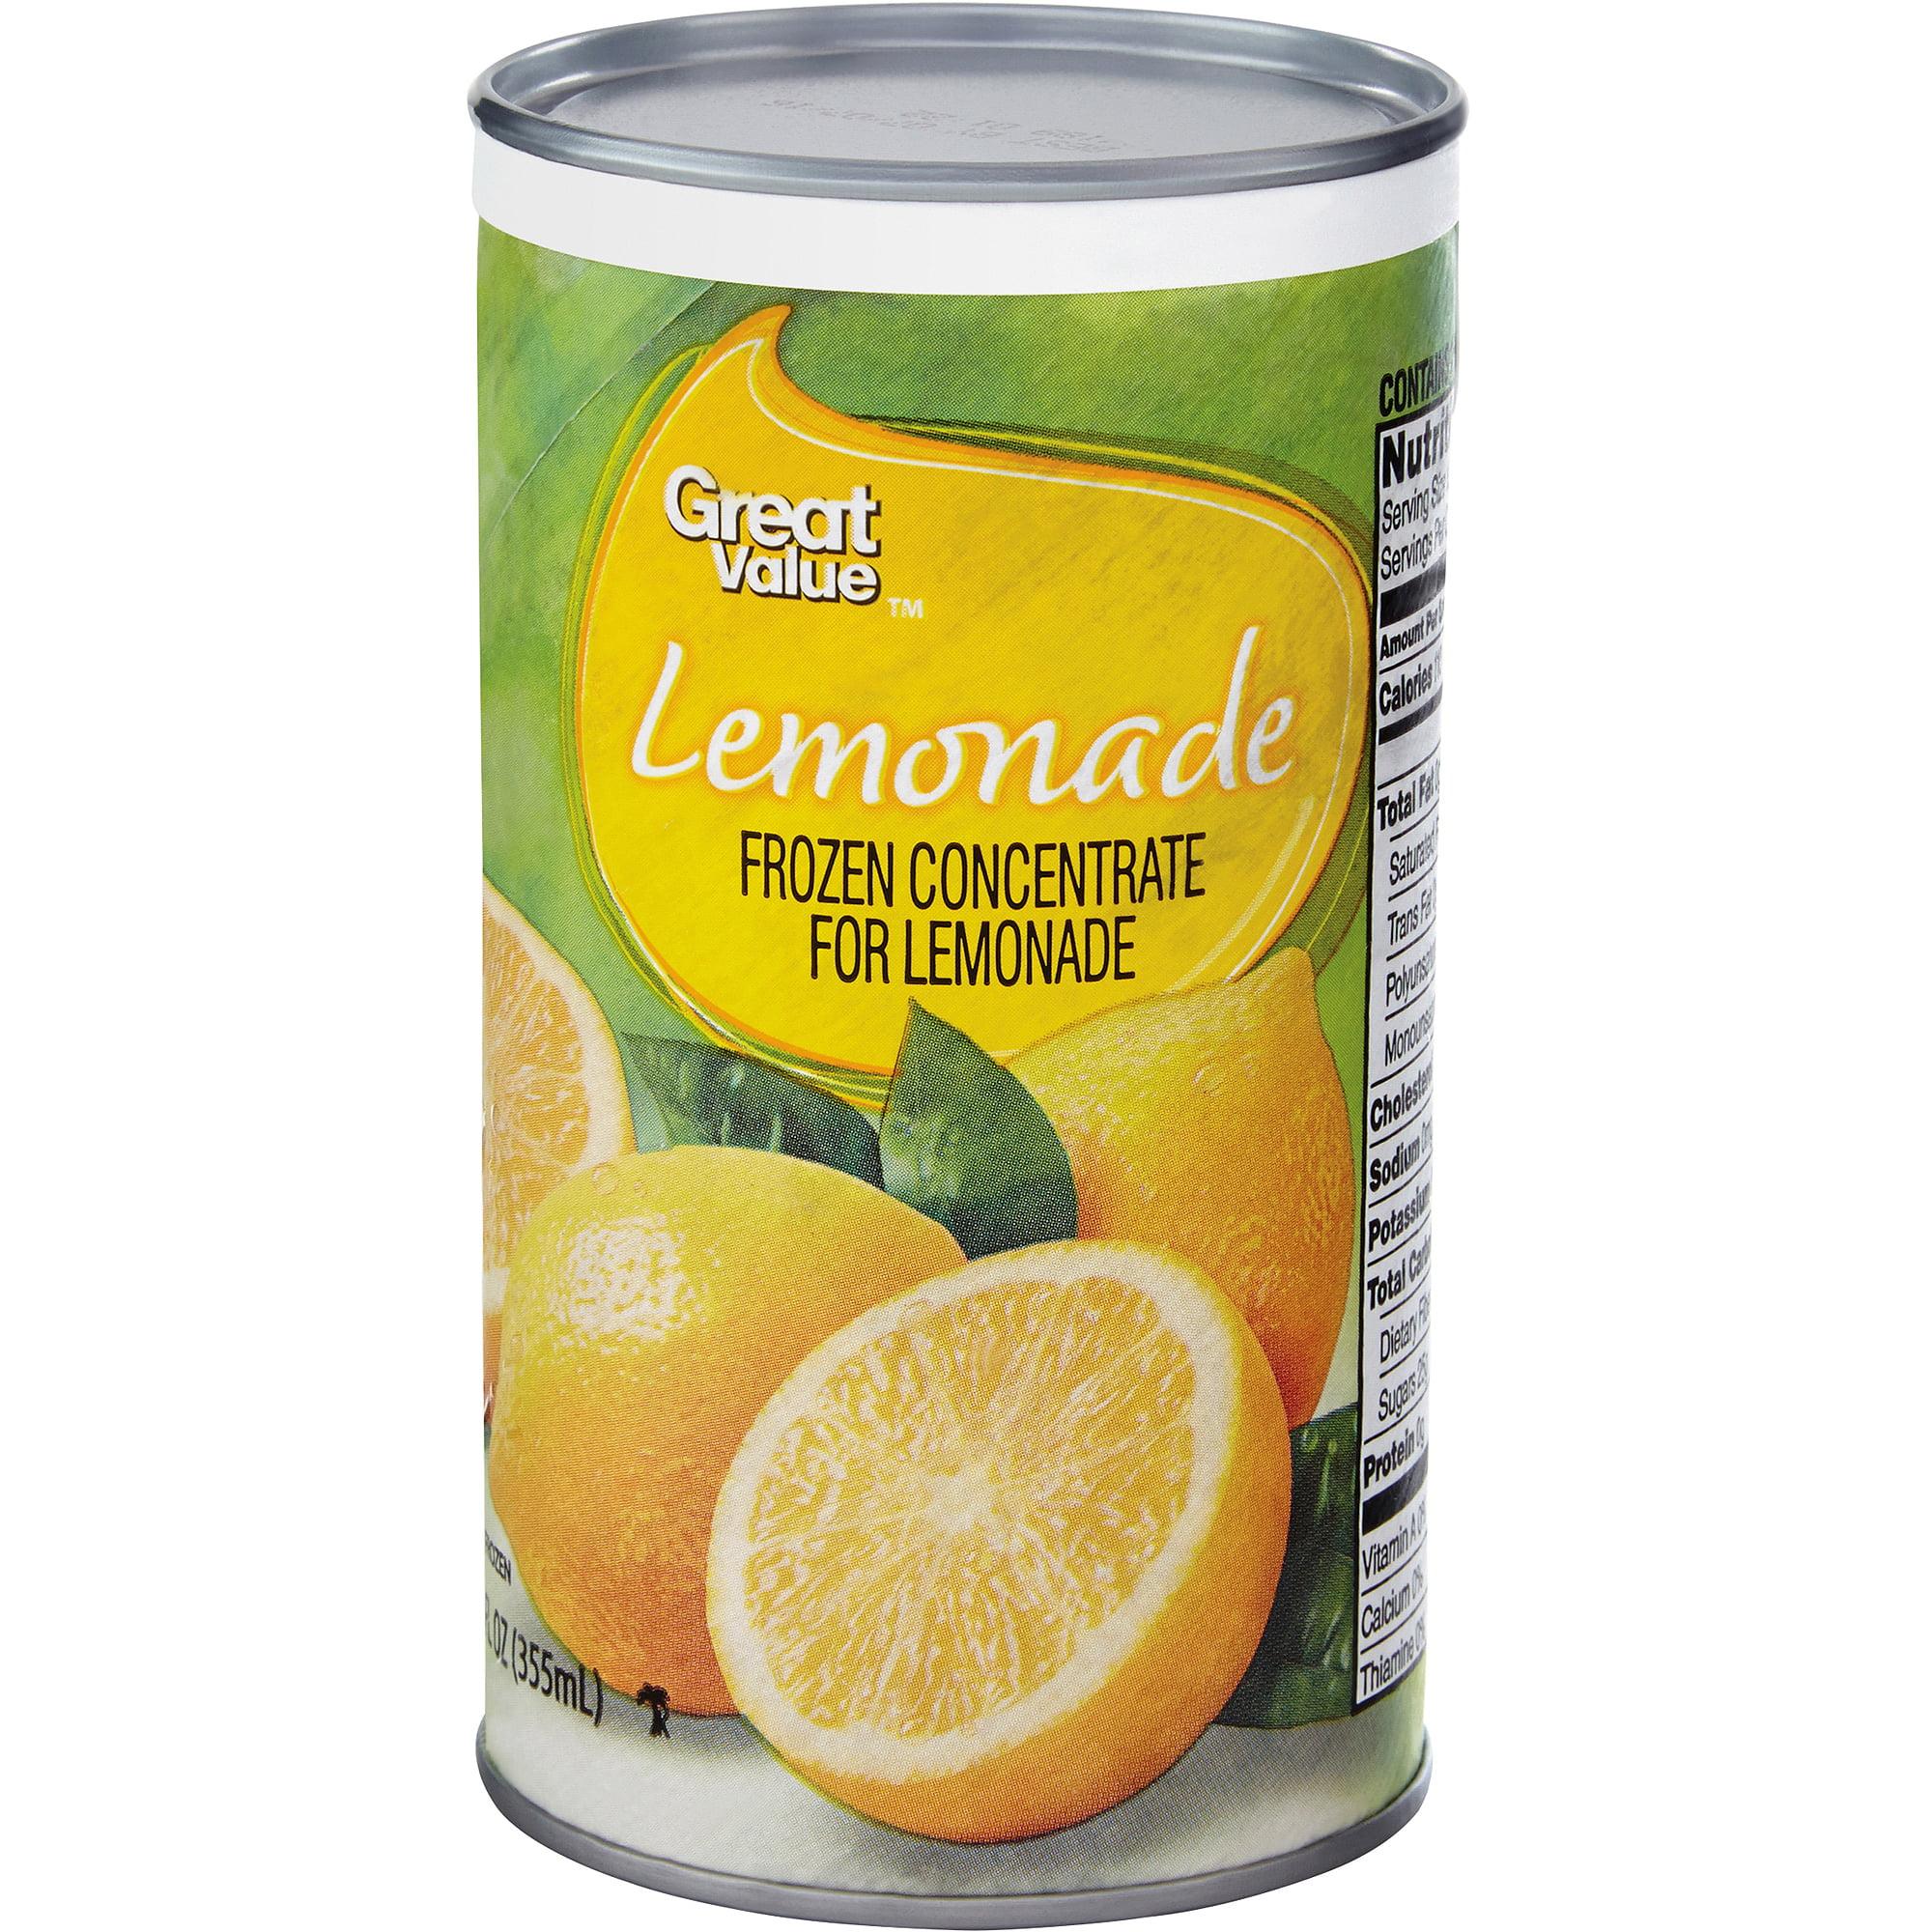 Great Value Lemonade, 12 oz